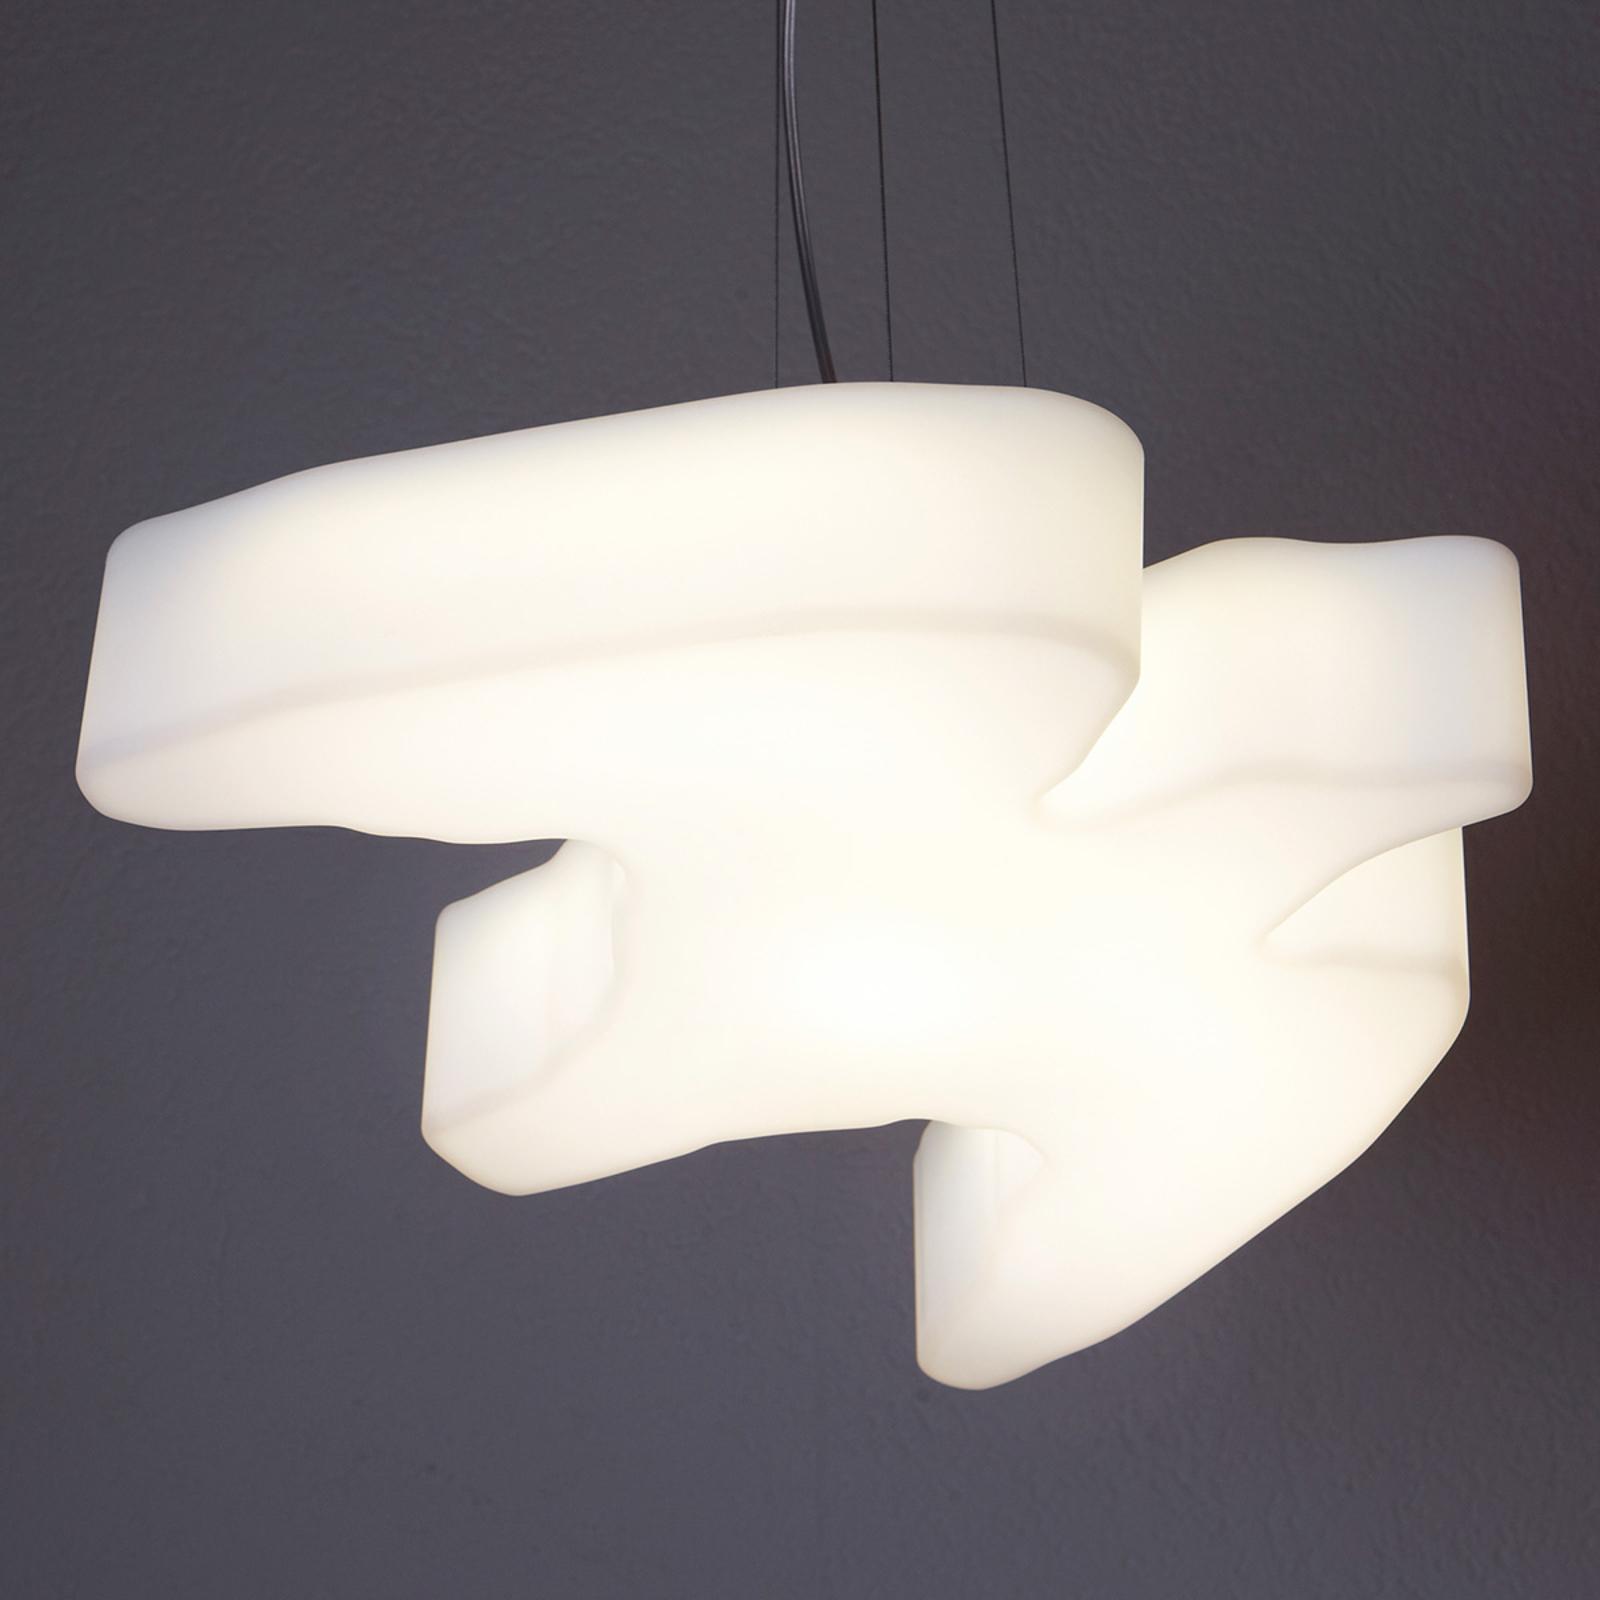 LED-hänglampa The Bird